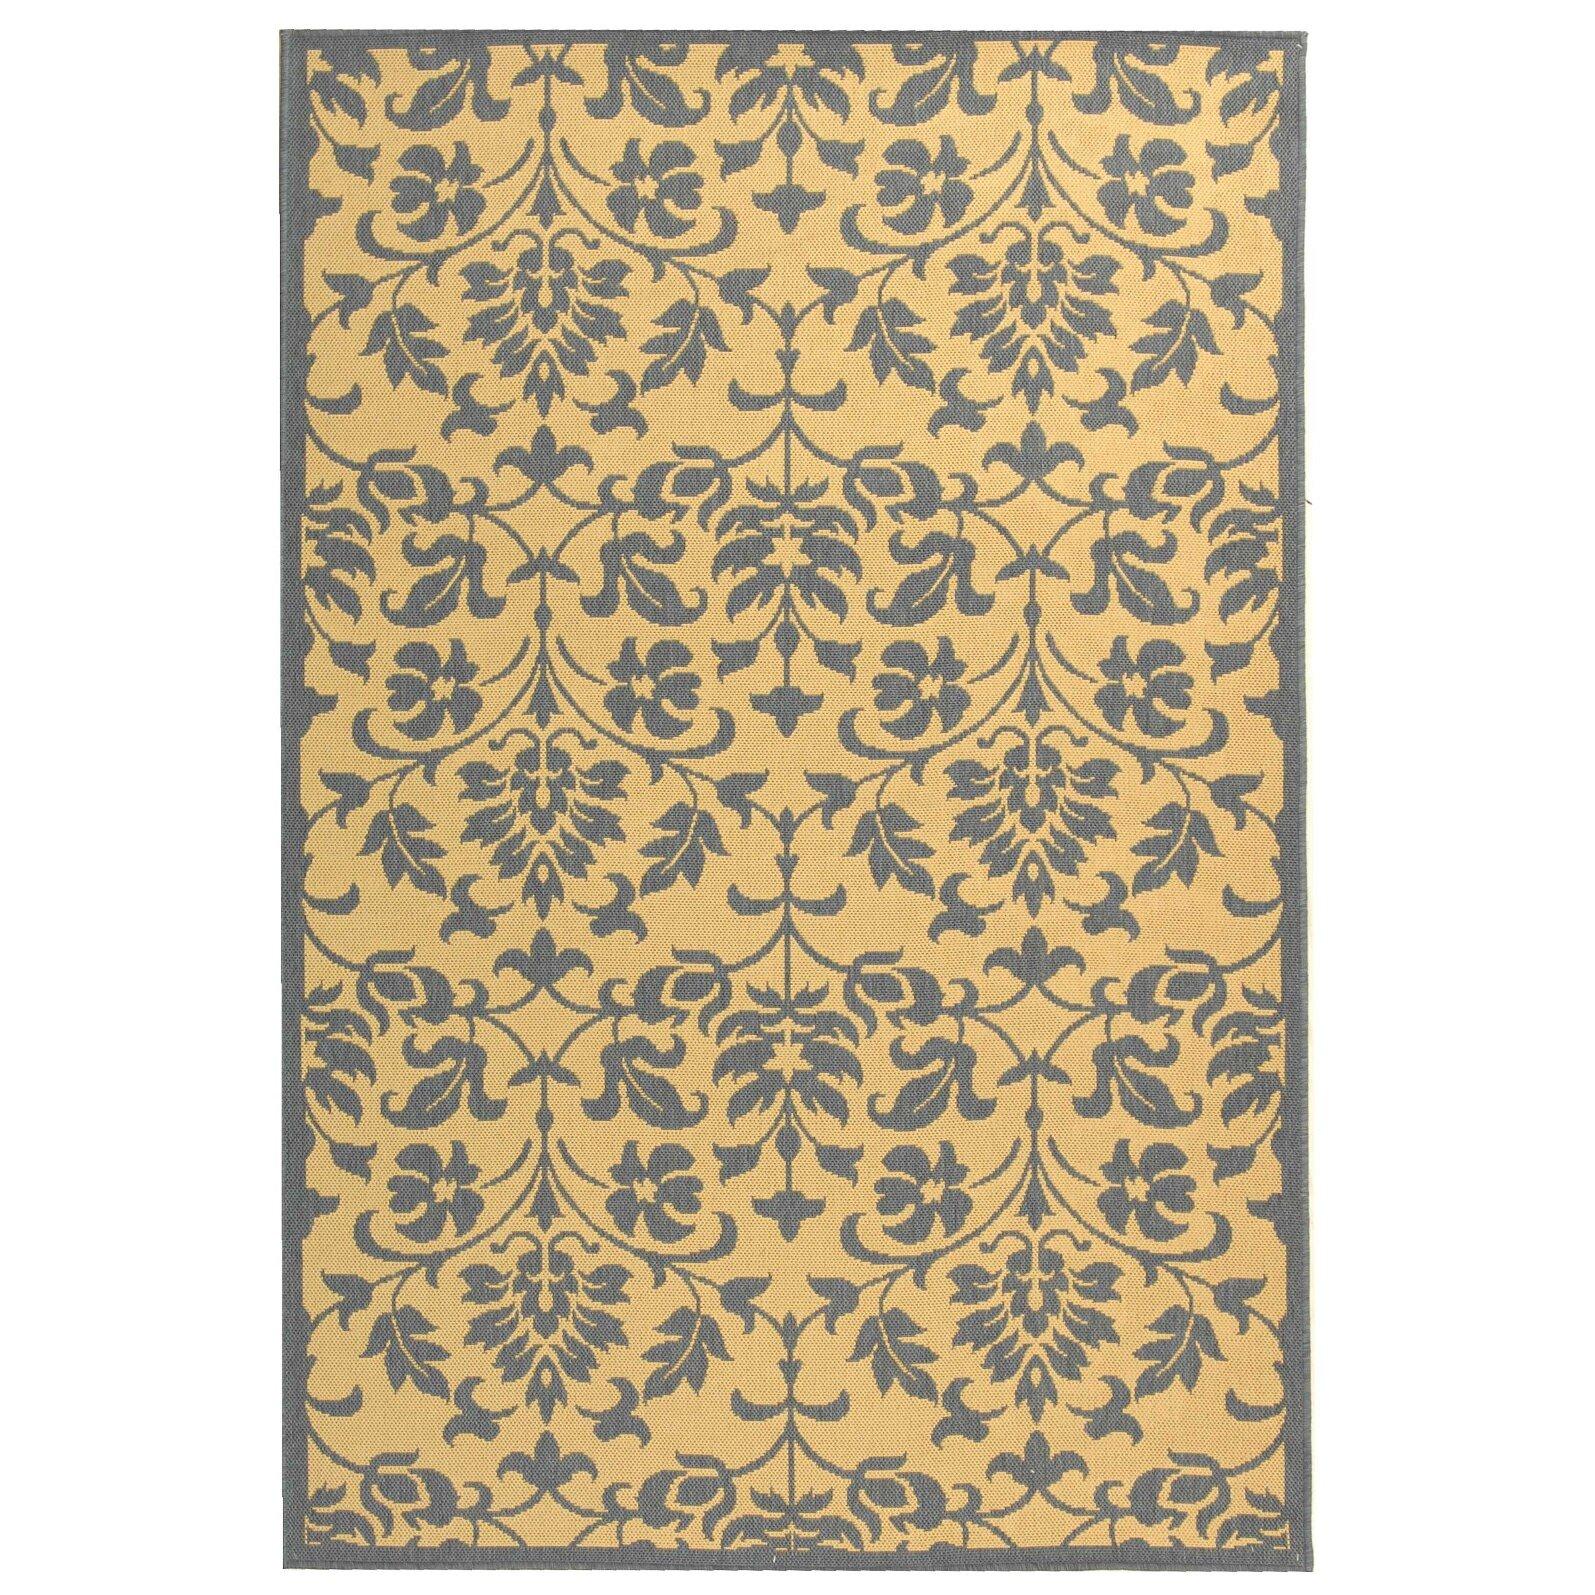 Astoria grand beasley natural blue indoor outdoor area rug for Blue indoor outdoor rug